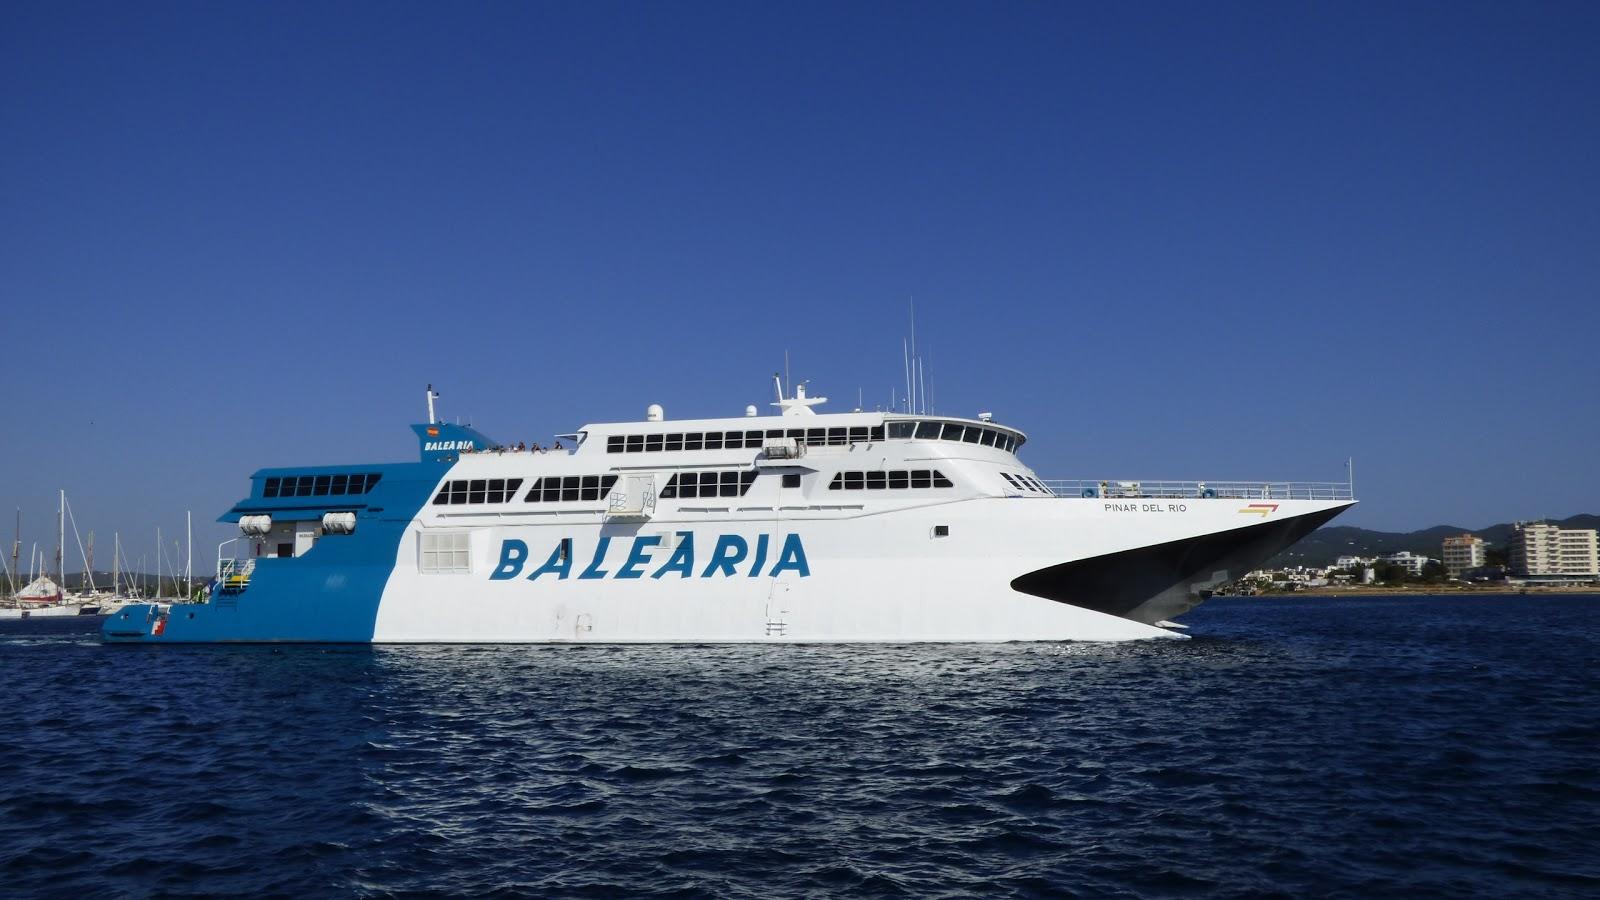 Fähre der Reederei Baleària - Pinar del Rio